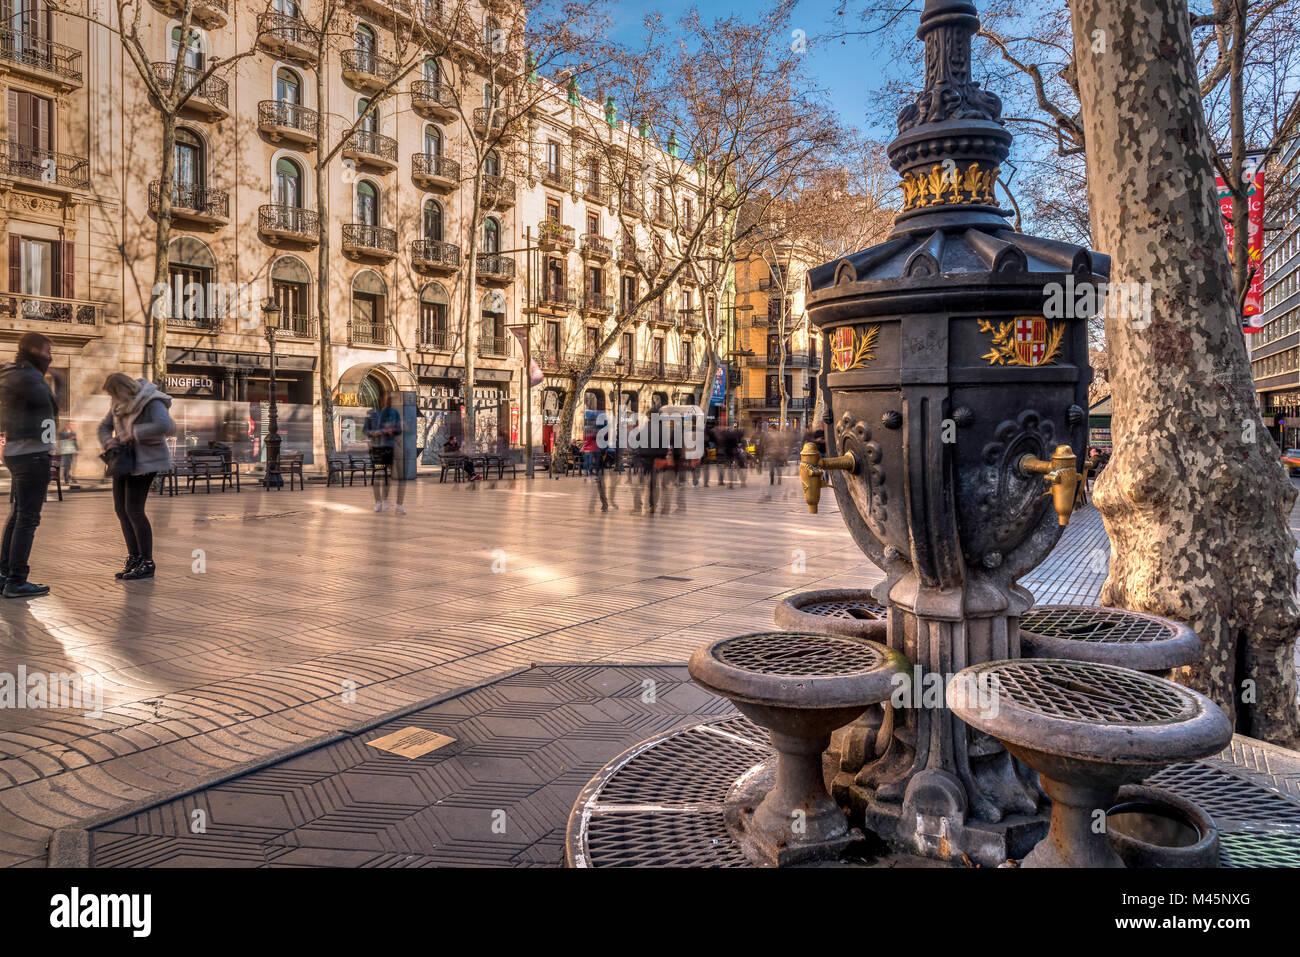 Vintage drinking fountain along Rambla pedestrian mall, Barcelona, Catalonia, Spain - Stock Image